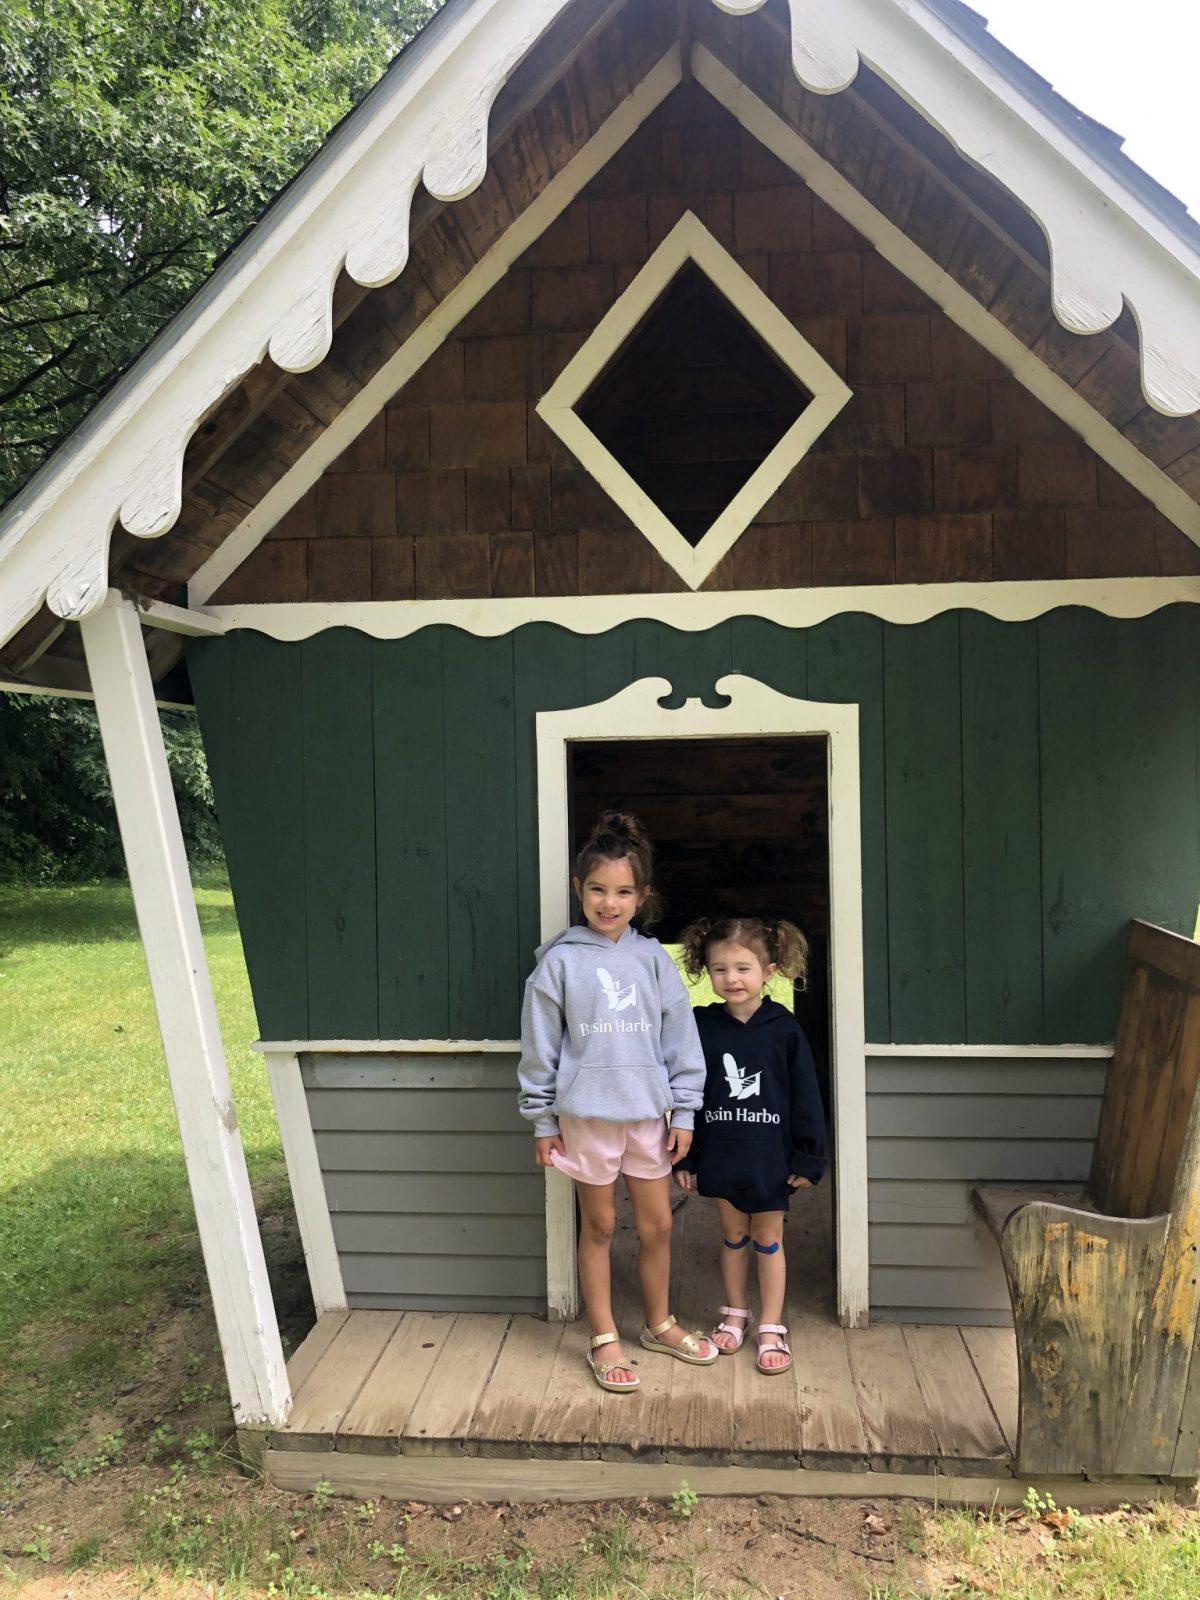 Basin Harbor Kids Camp House